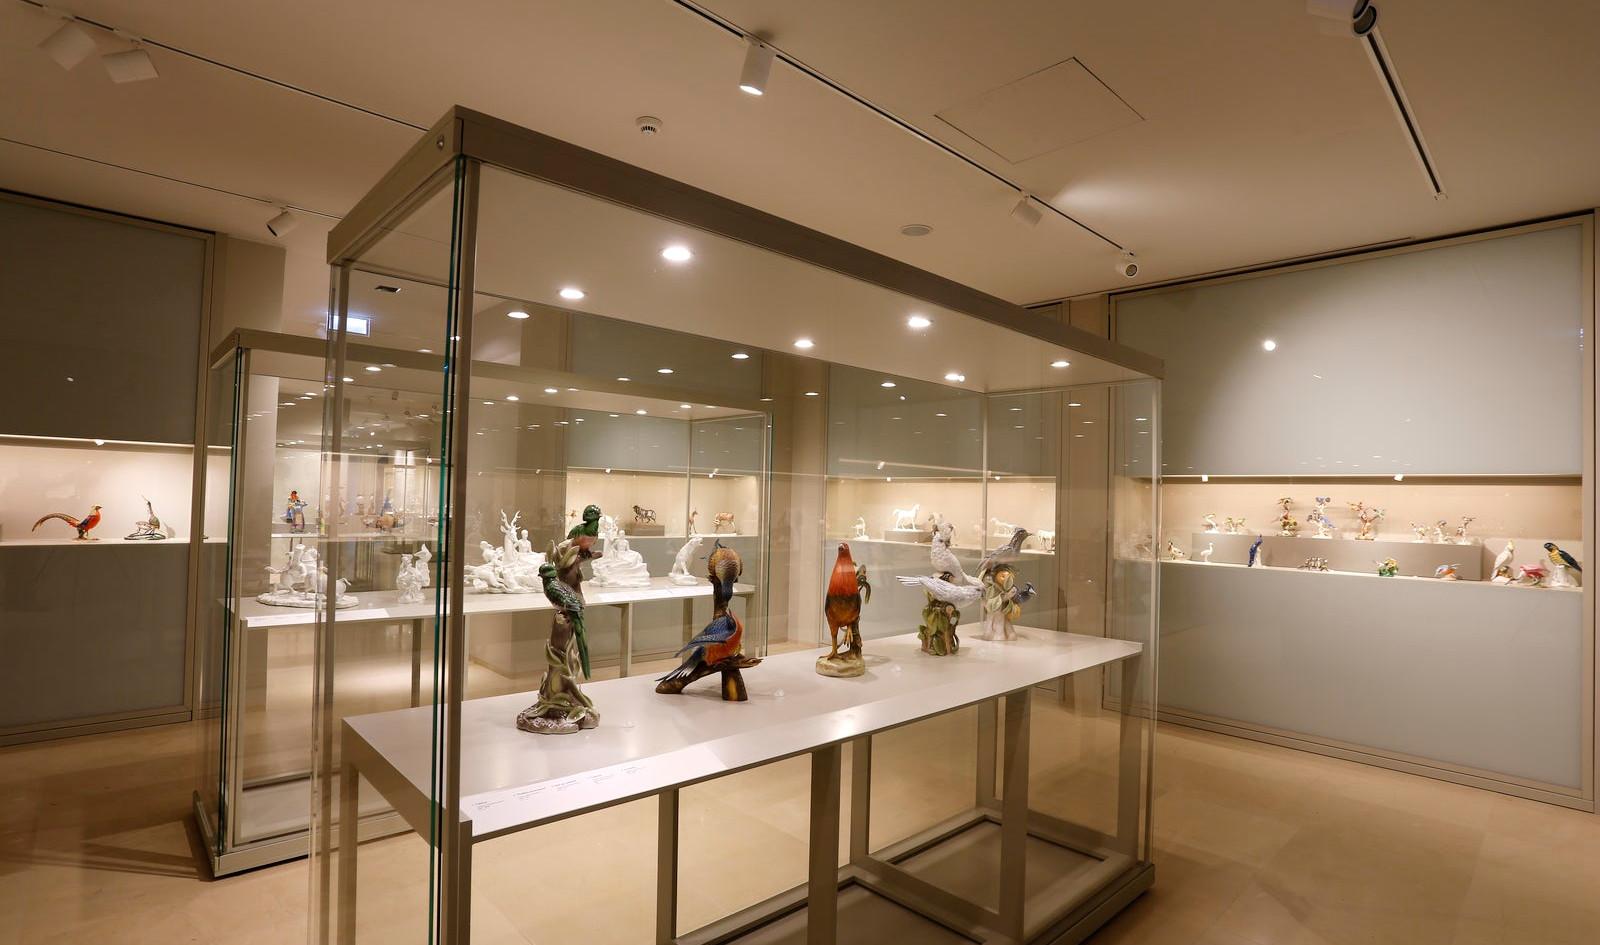 Museu Vista Alegre - Ílhavo